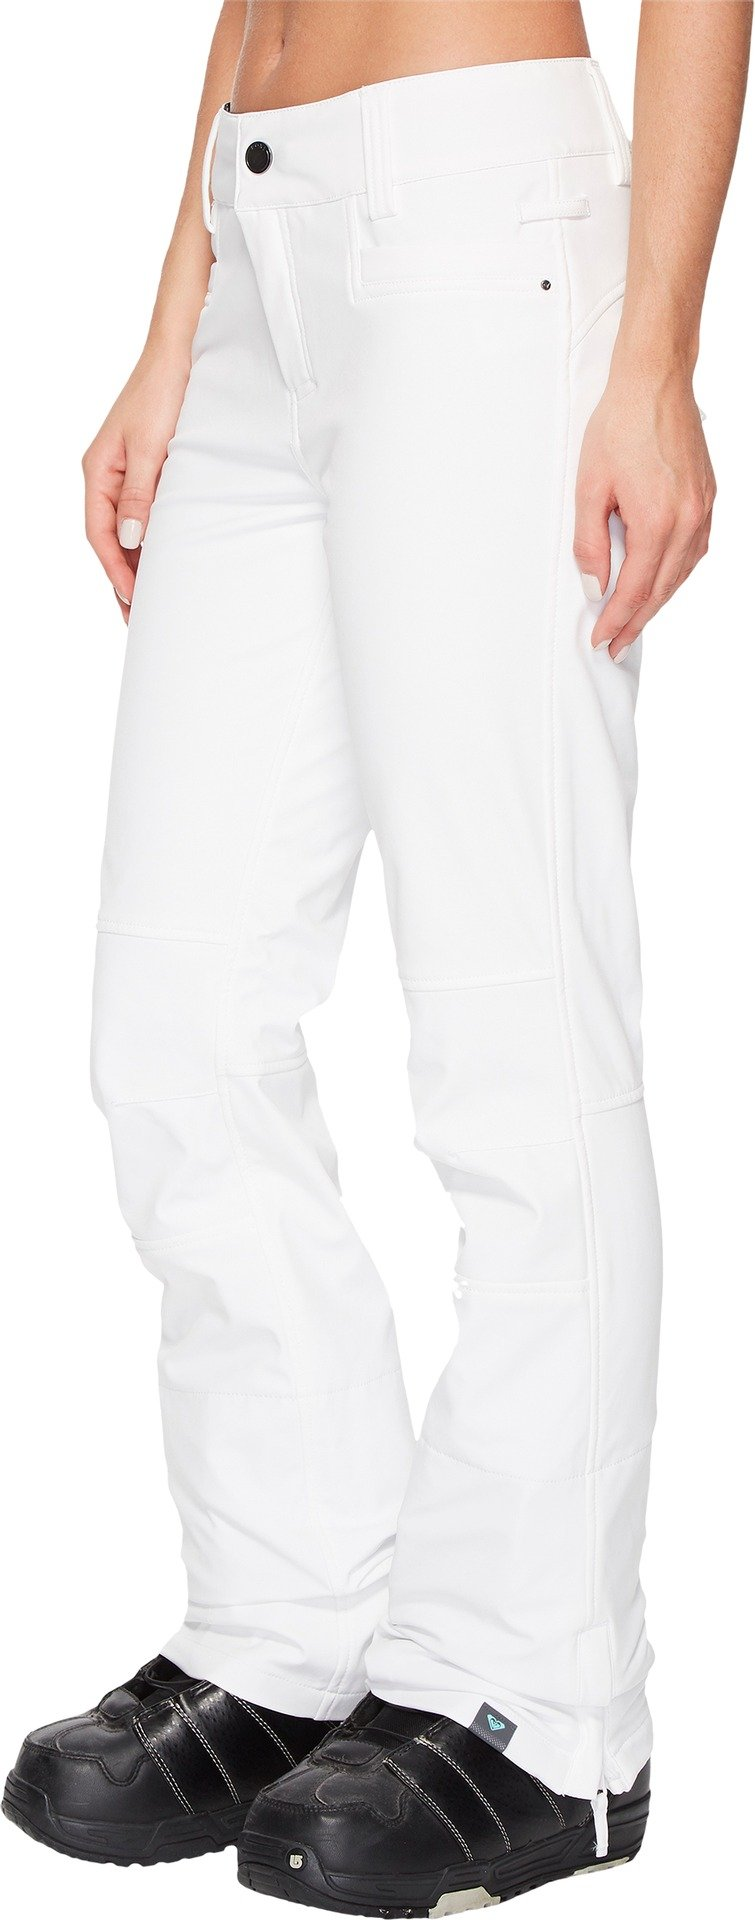 Roxy Snow Junior's Creek Snow Pant, Bright White New, XL by Roxy (Image #2)